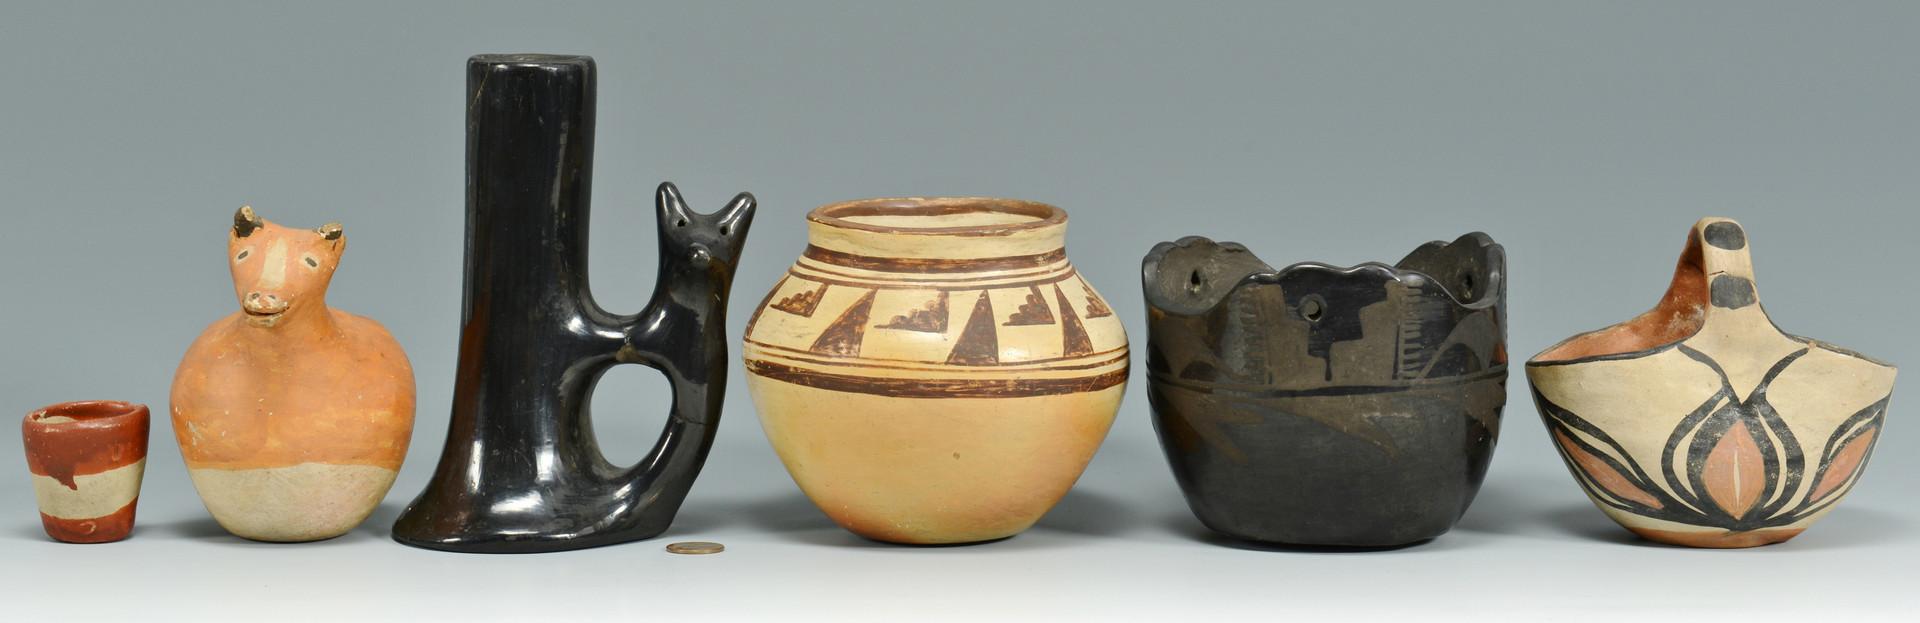 Lot 614: Southwestern Indian Pottery, 6 items